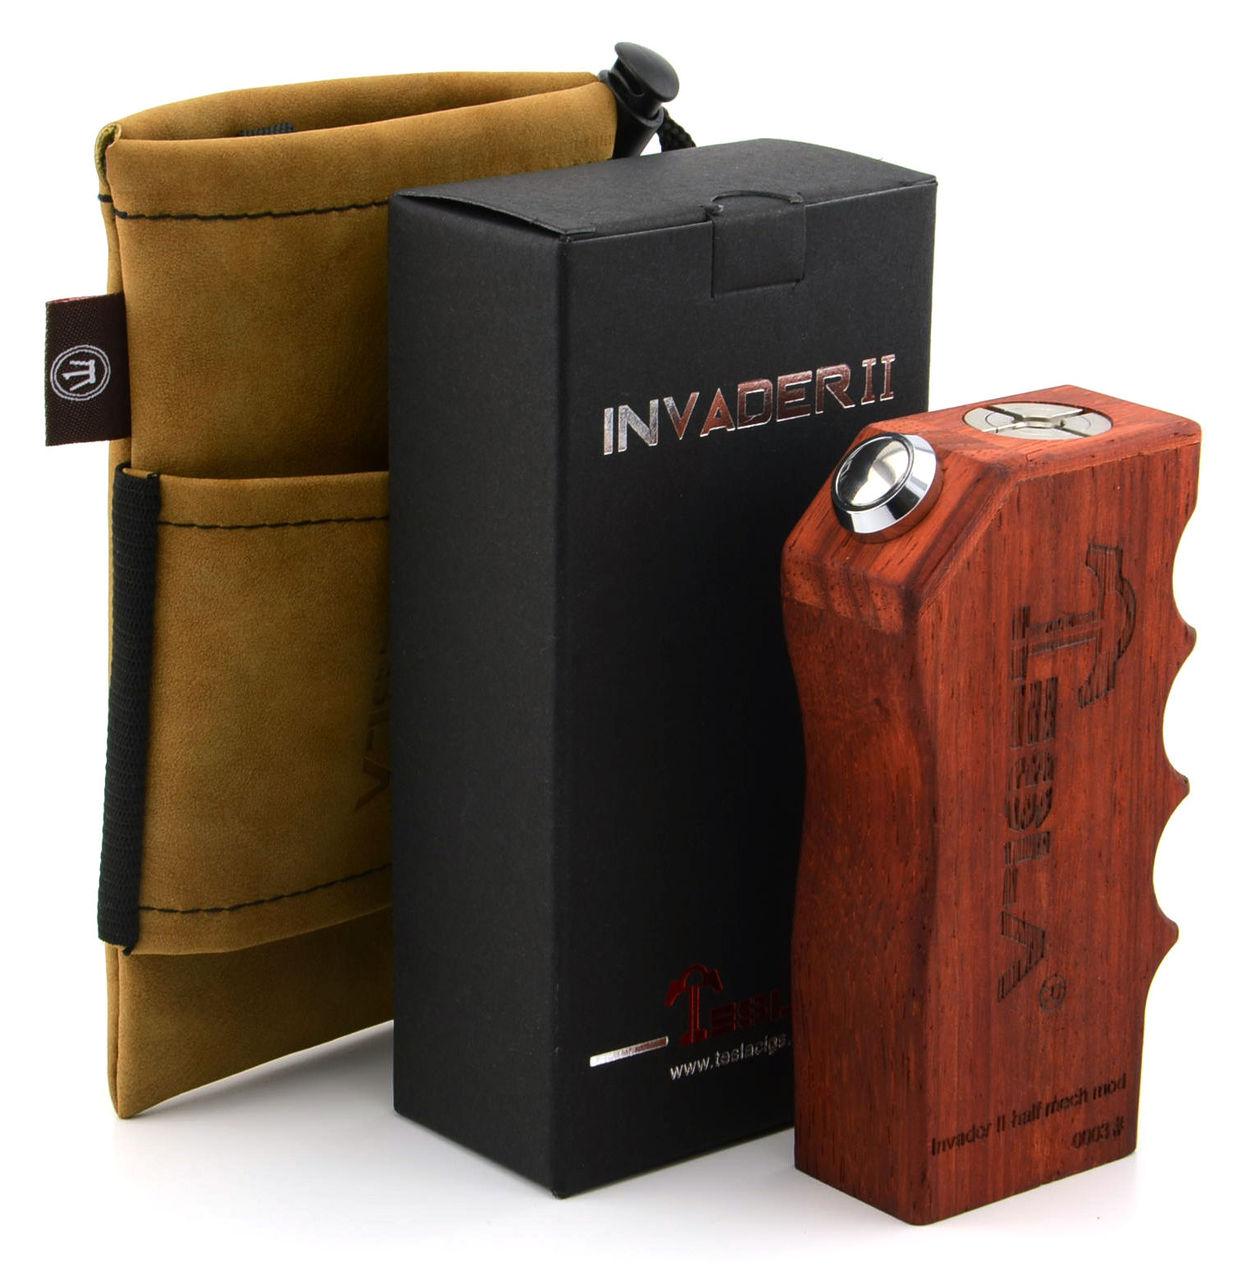 Tesla Invader II Rosewood Box Mod